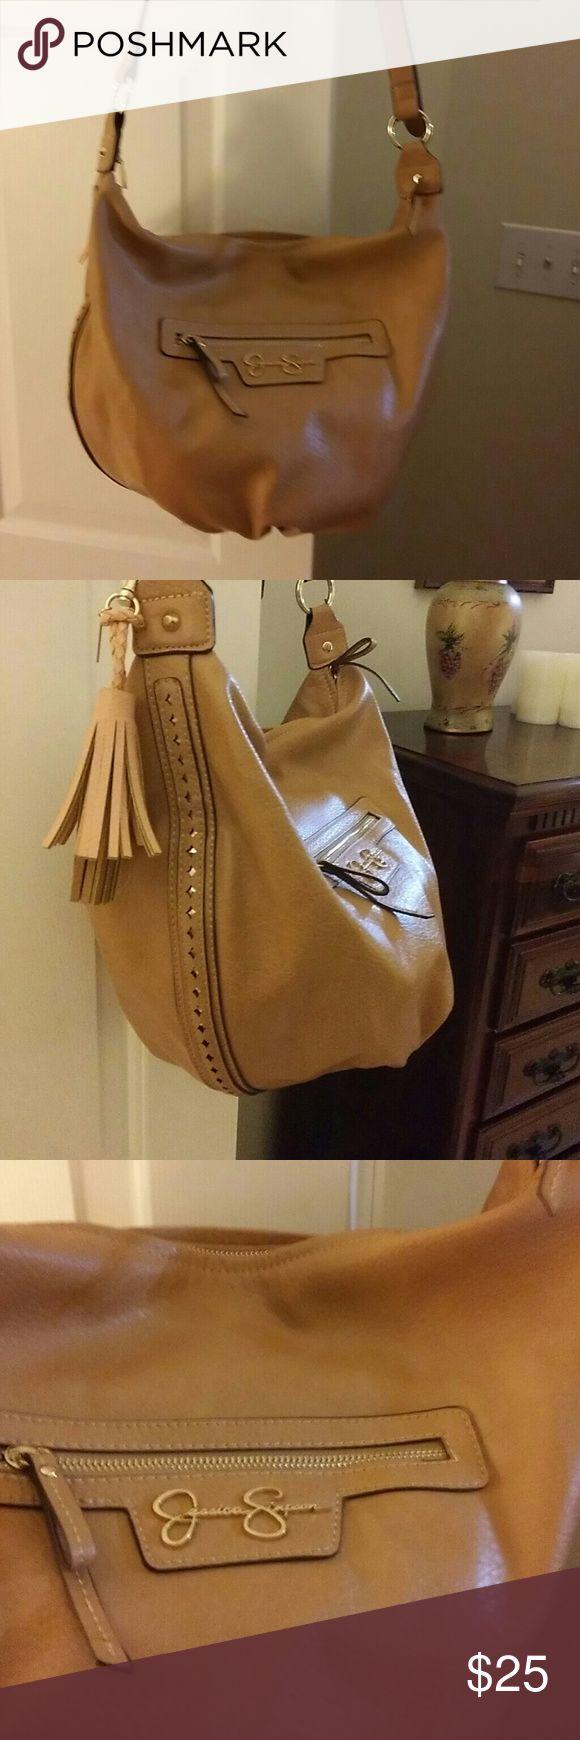 Jessica Simpson shoulder bag Jessica Simpson hobo shoulder bag in excellent condition Jessica Simpson Bags Shoulder Bags